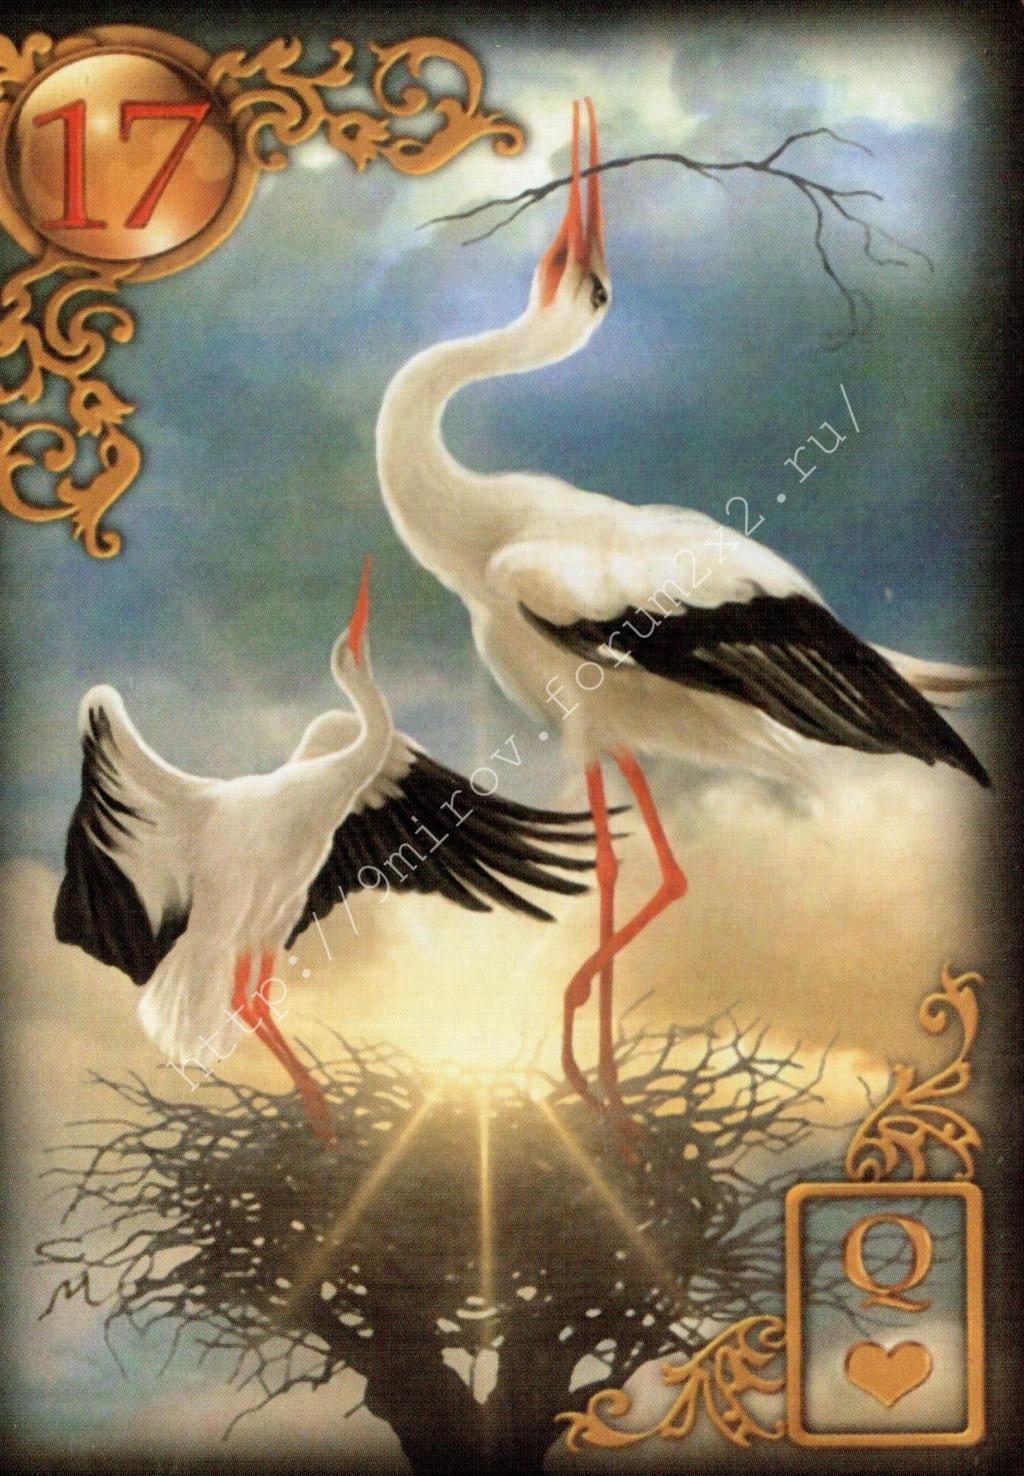 Золотые мечты Ленорман (Расширенное издание) | Gilded Reverie Lenormand. Галерея.  Water112